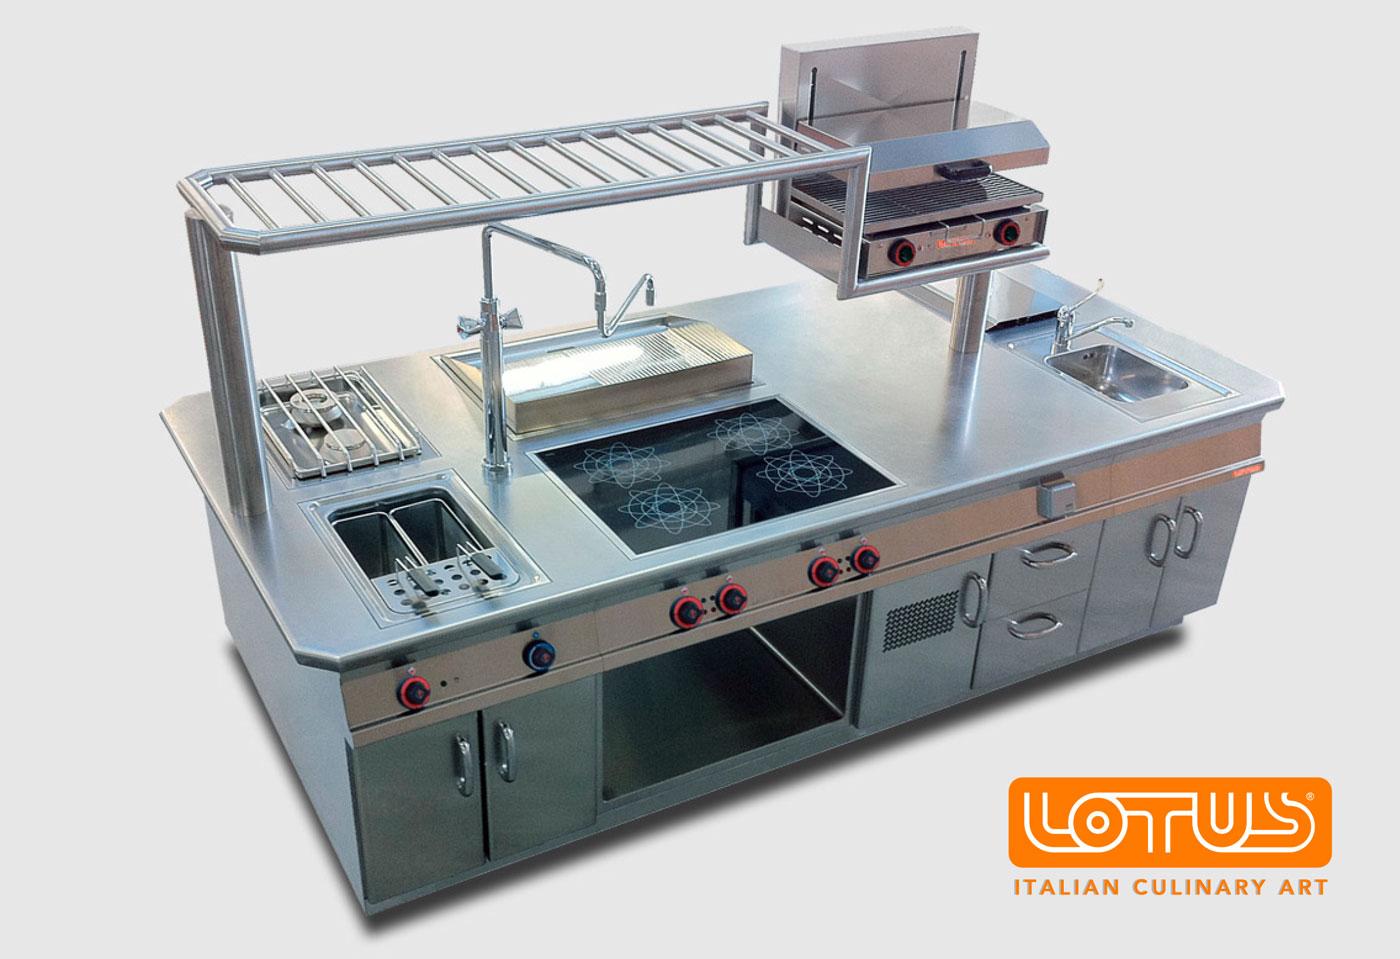 Cucine lotus modularità ed estetica per una cucina di qualità e